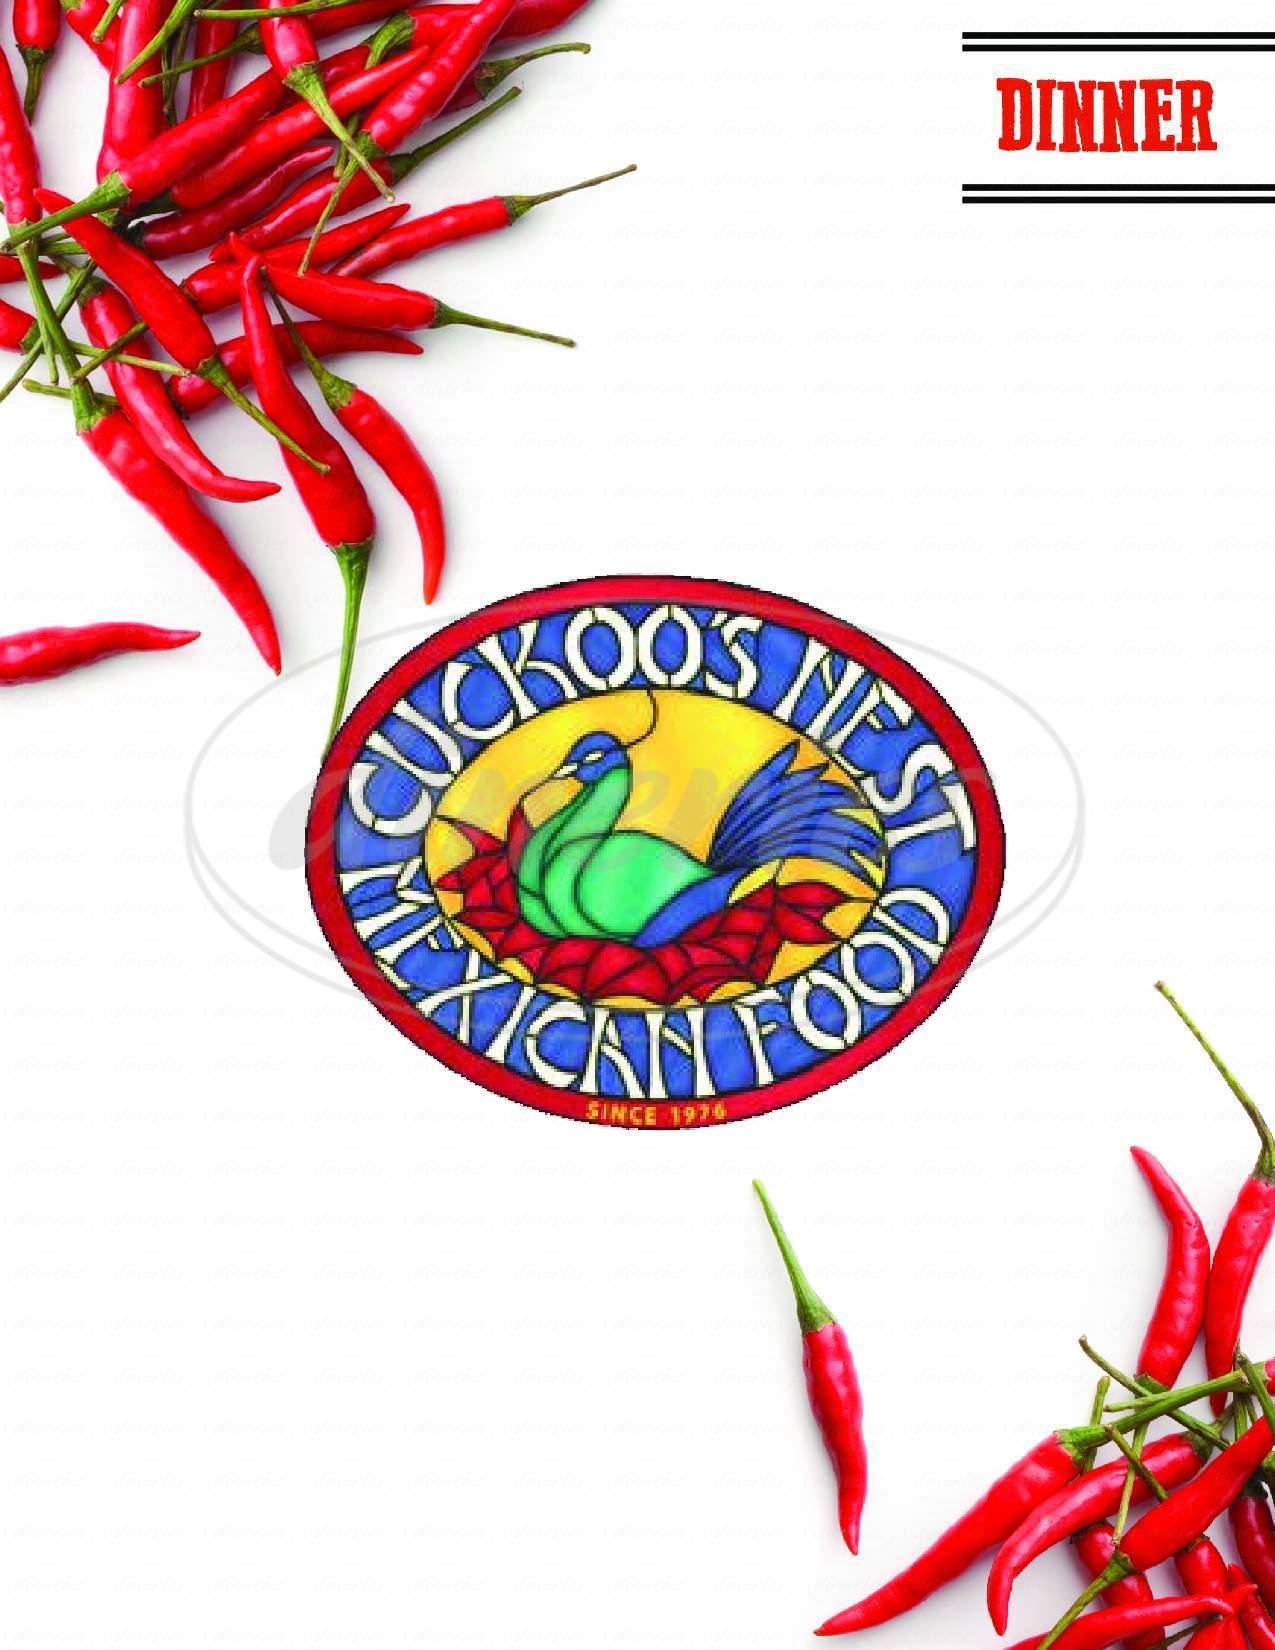 menu for Cuckoo's Nest